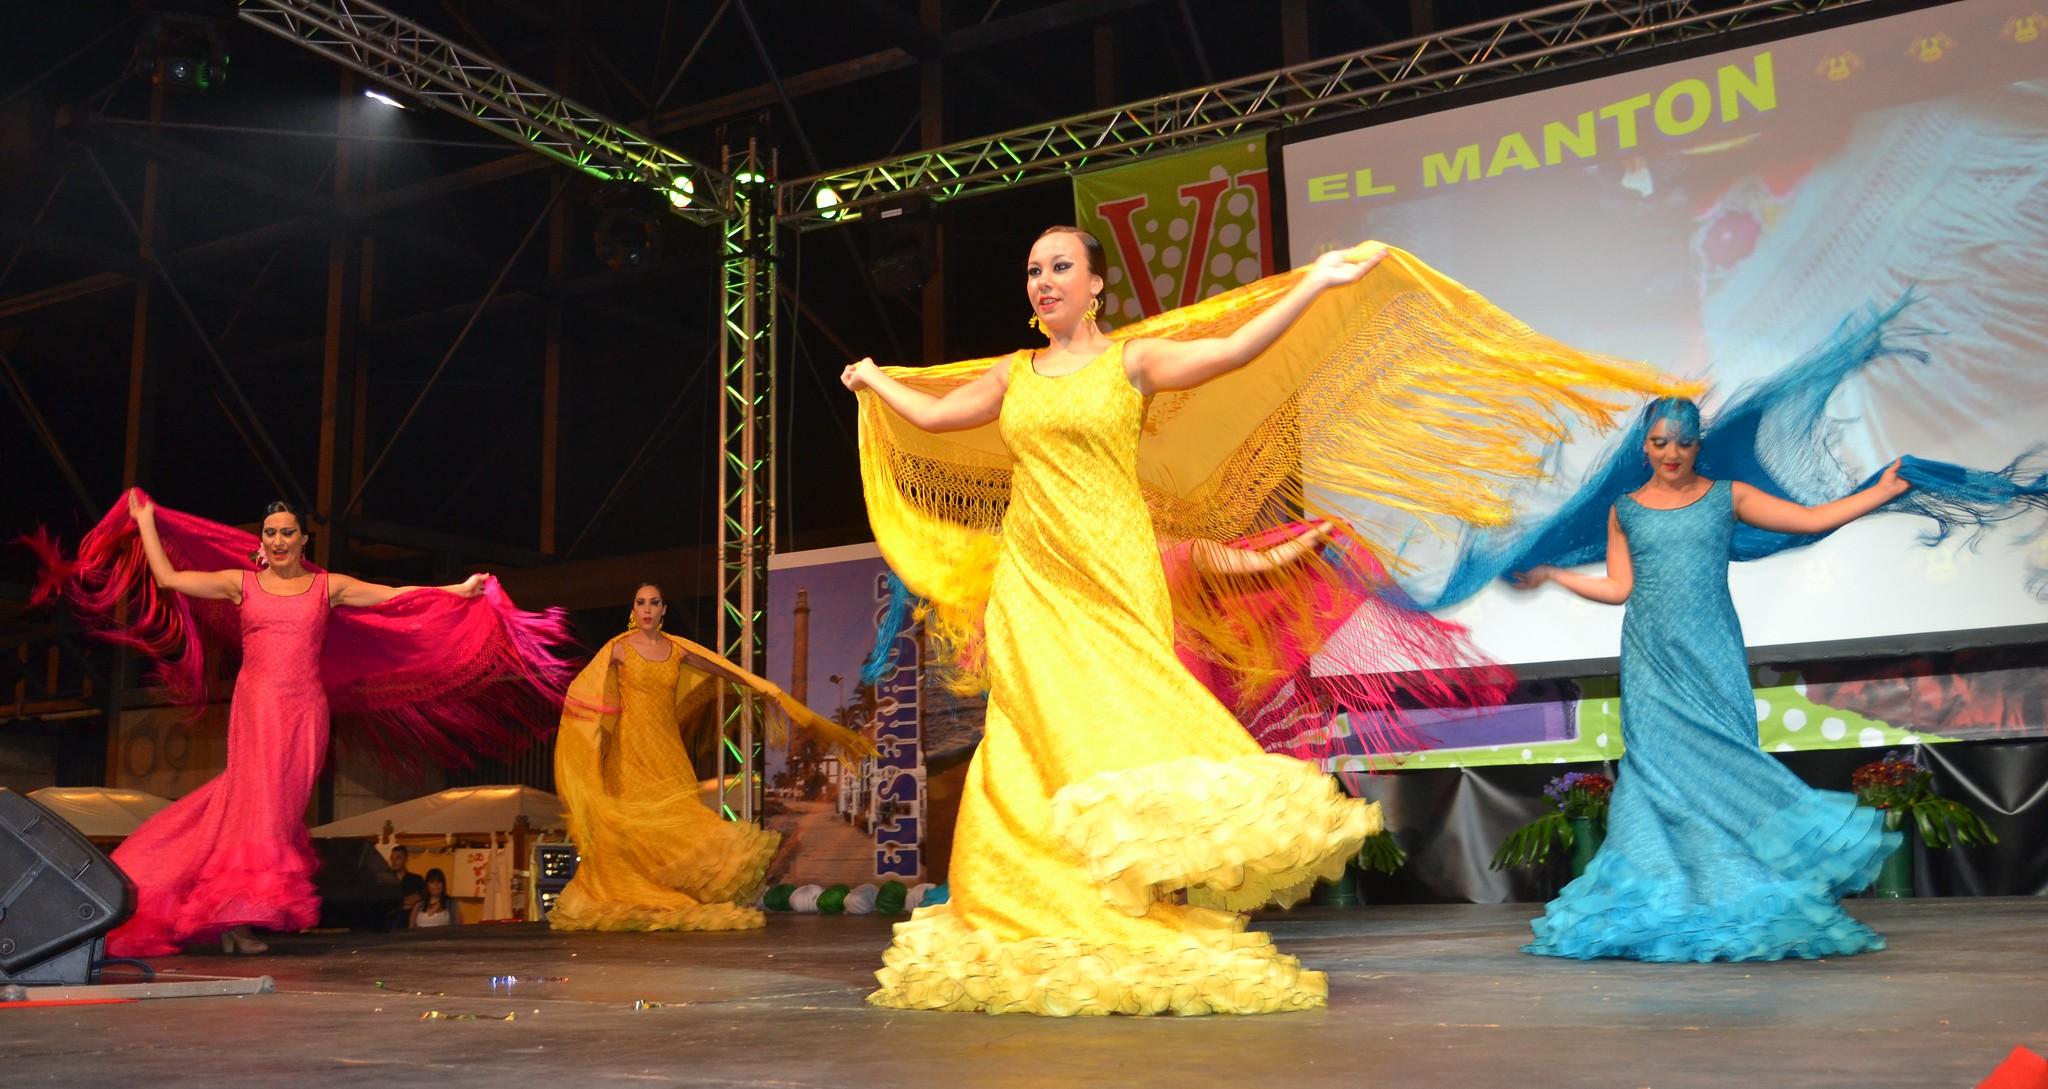 Gala Apertura Ballet de Paulina VI Feria abril 2013 Las Palmas de Gran Canaria